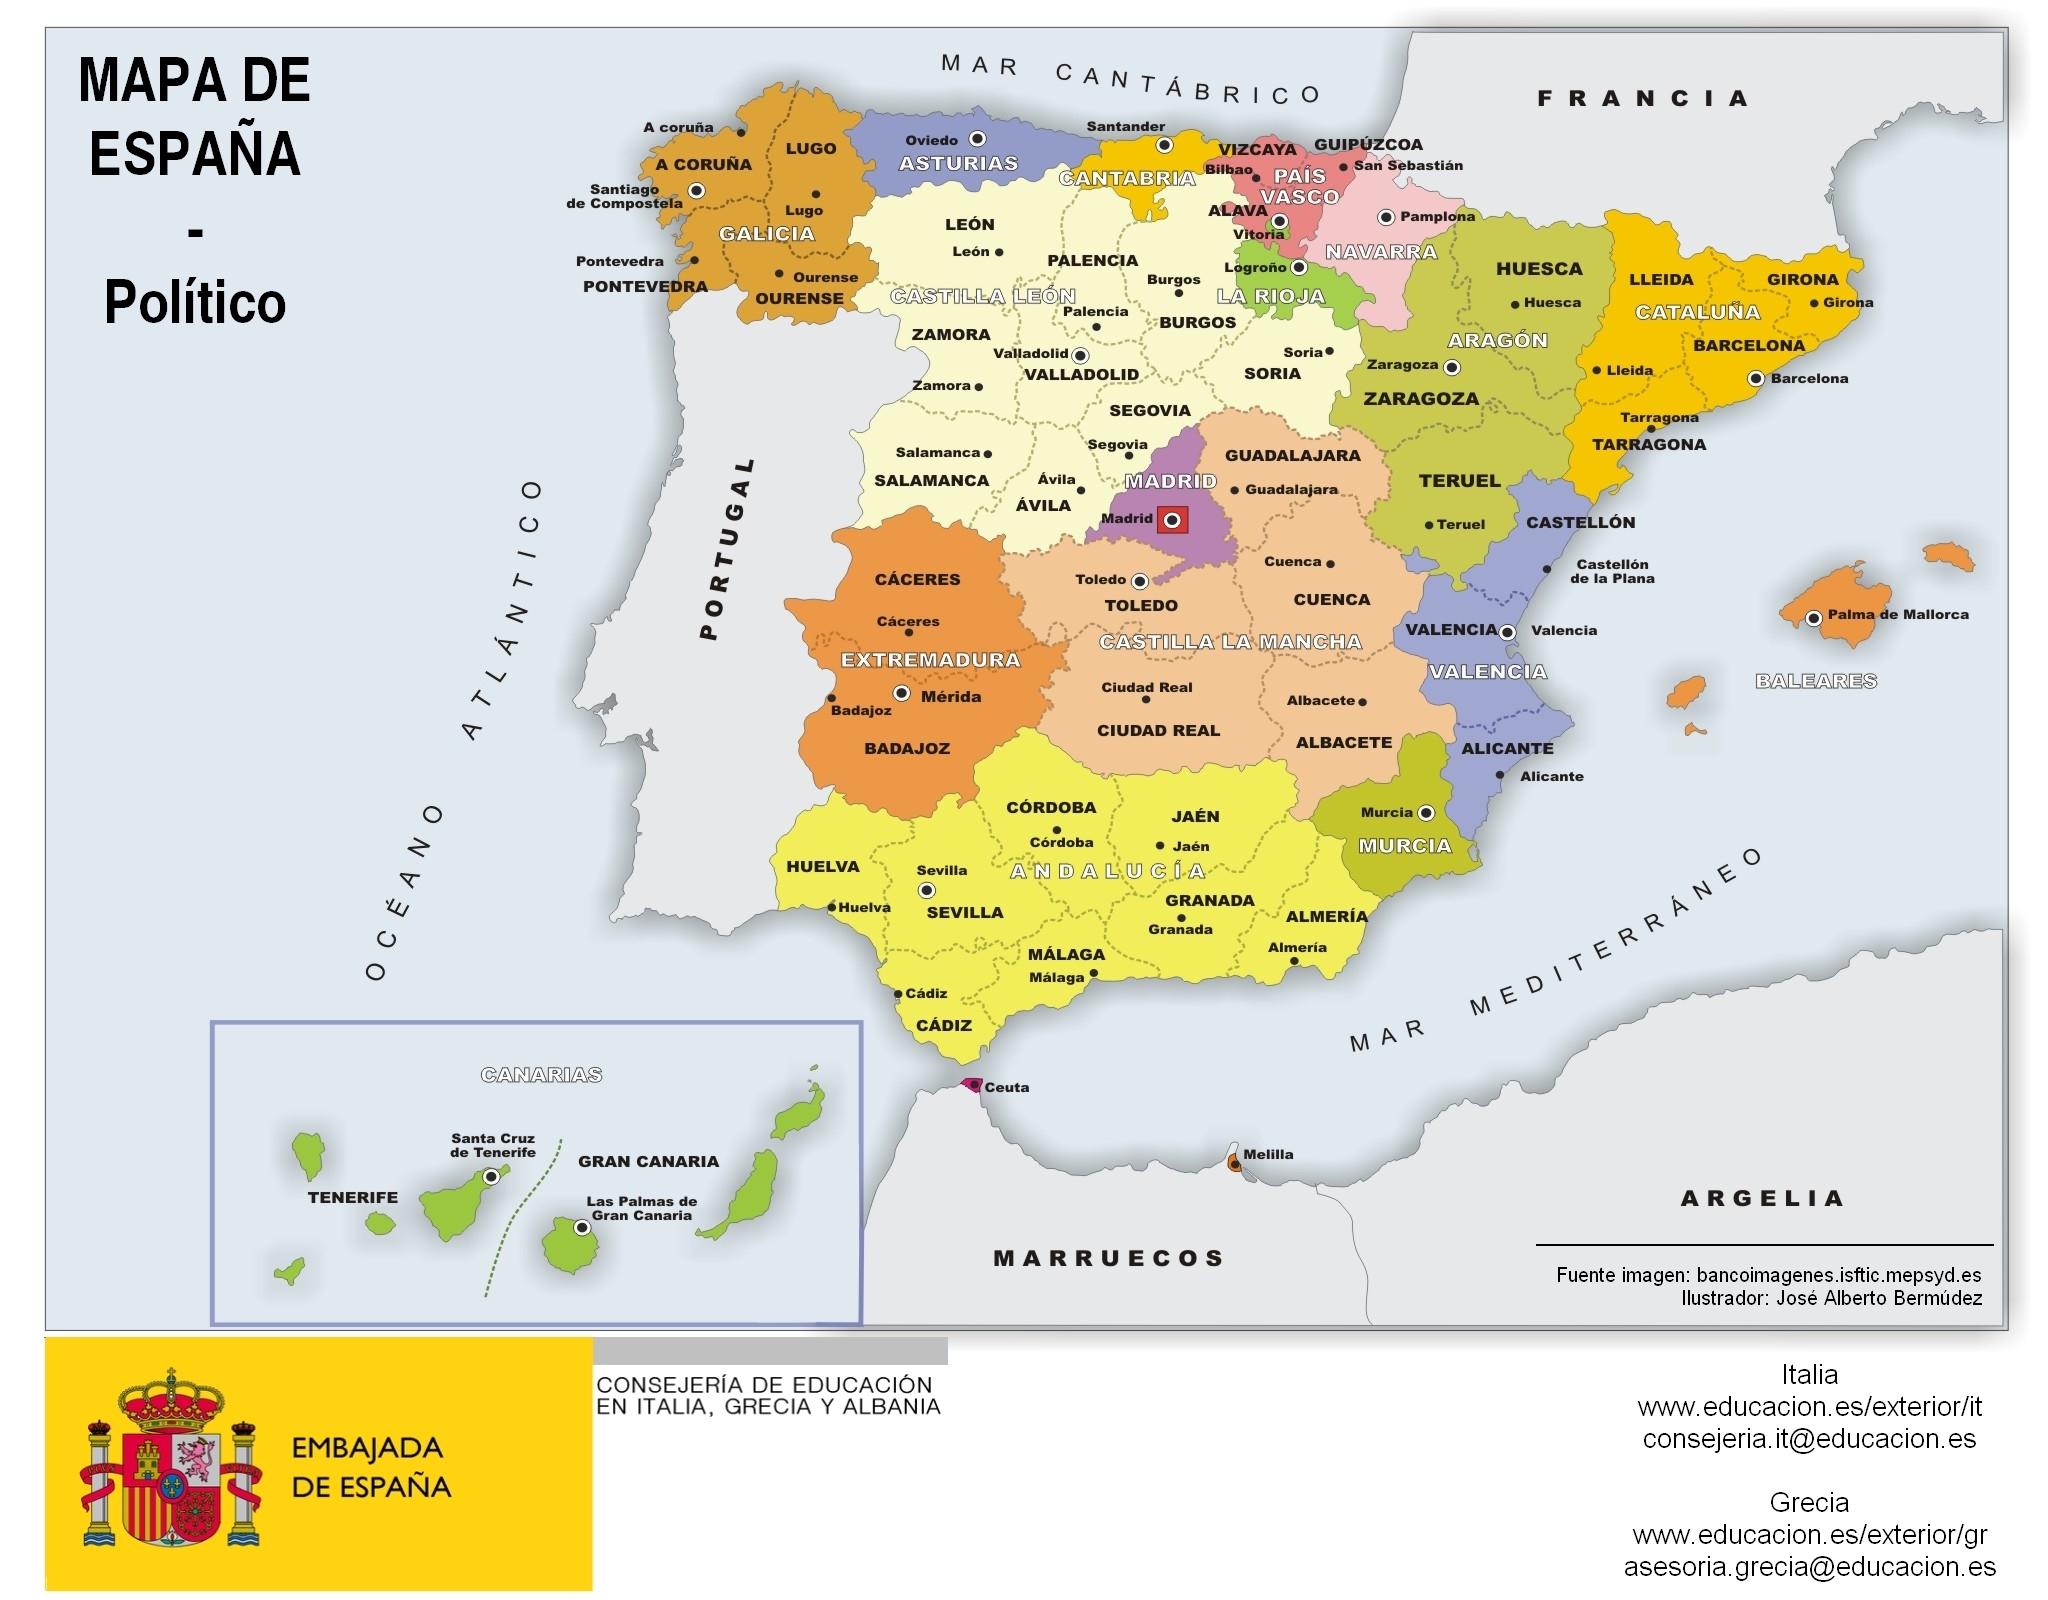 imagen cataluna espana: